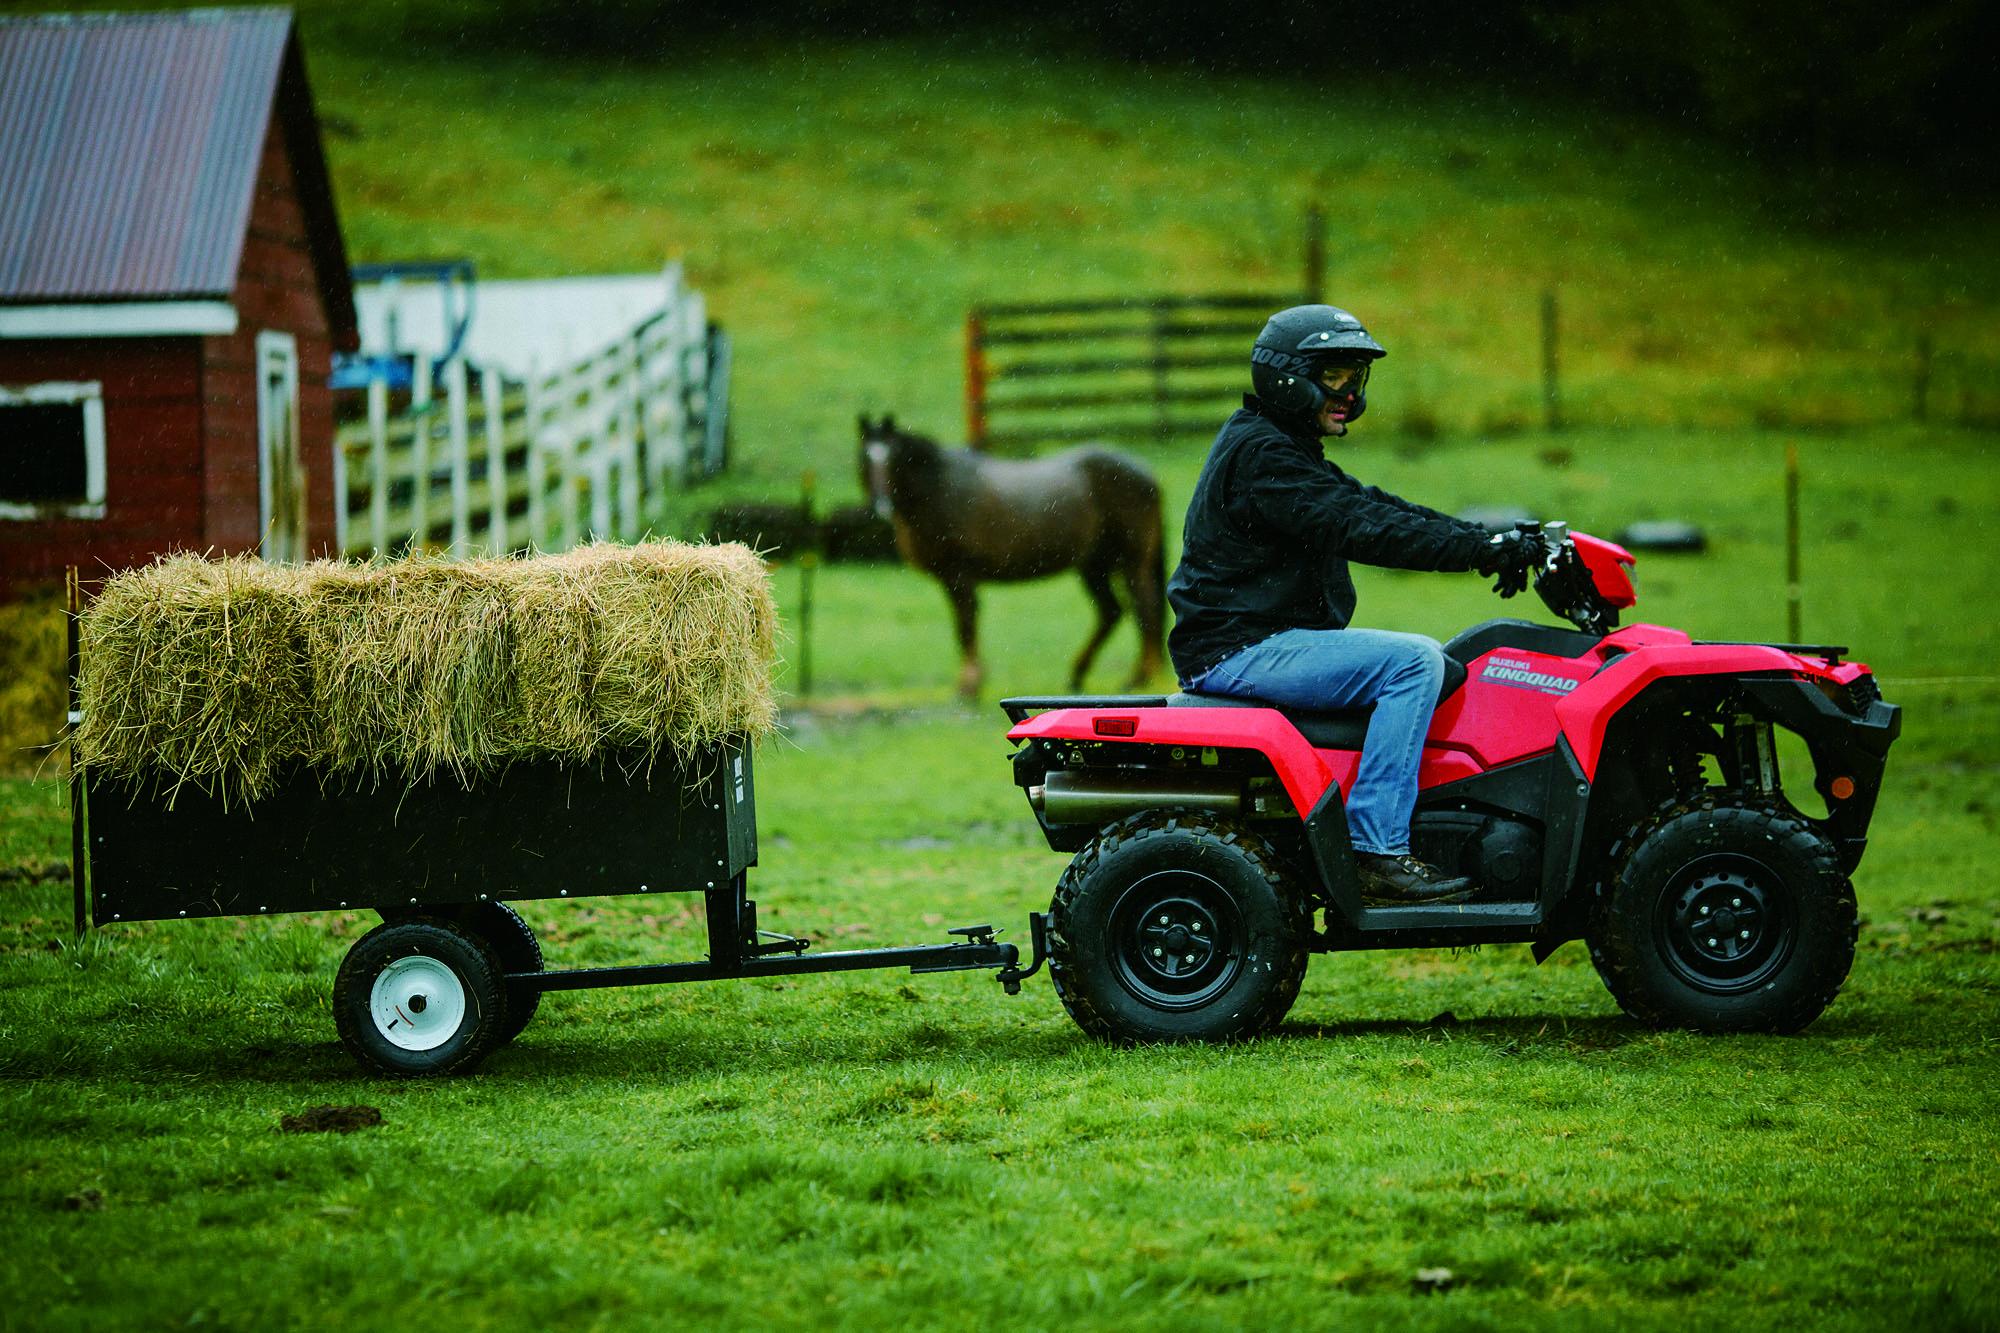 KingQuad ATV Pulling wagon of hay